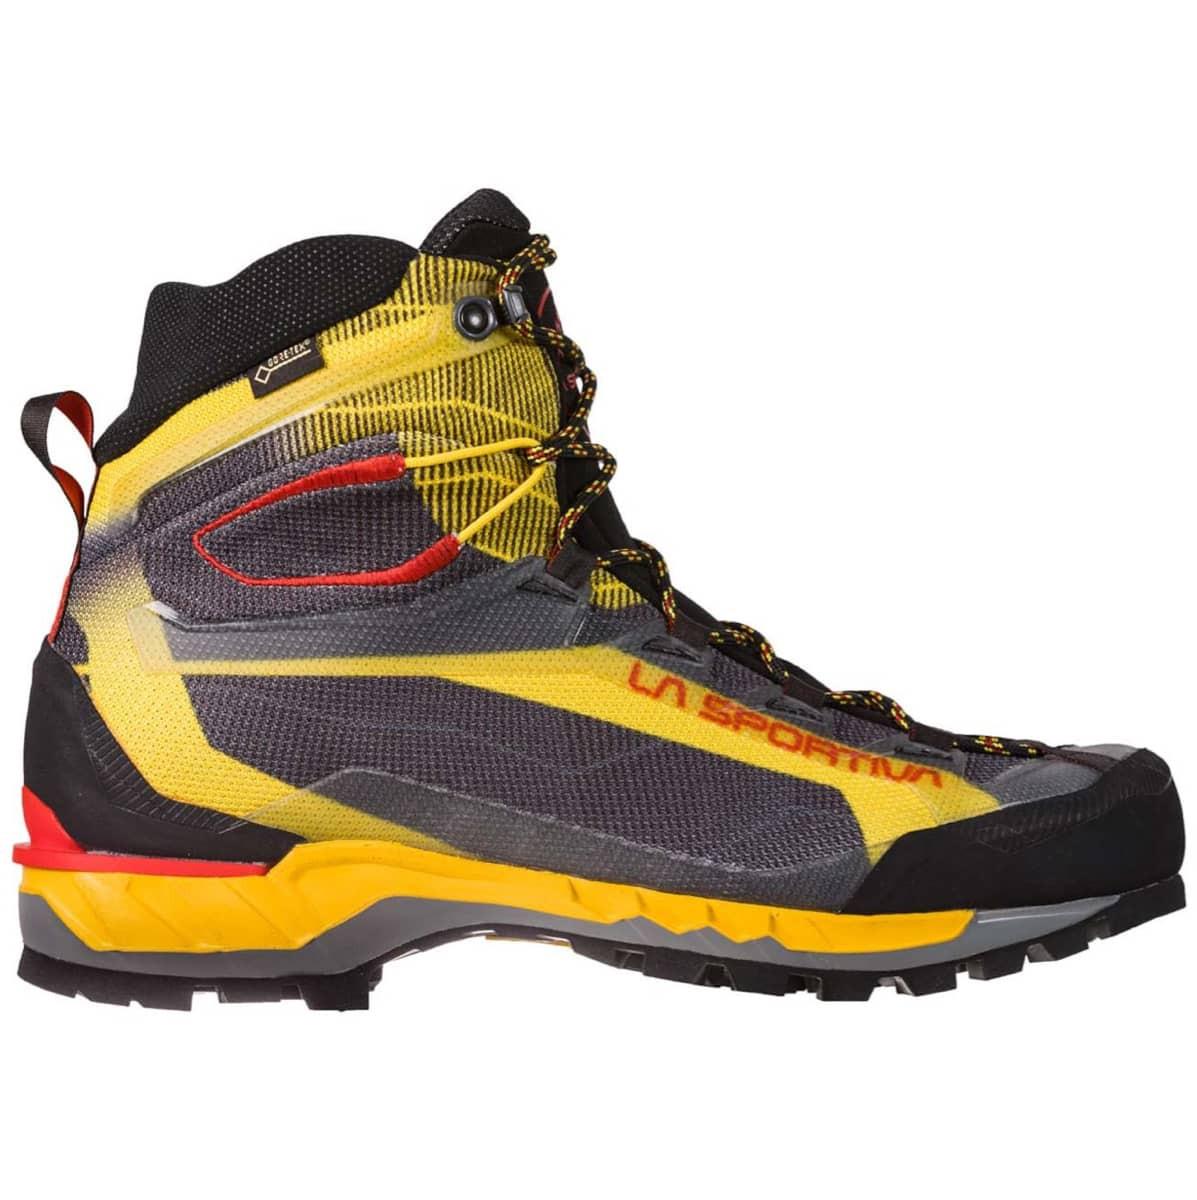 La Sportiva Trango Tech GTX M Black/Yellow